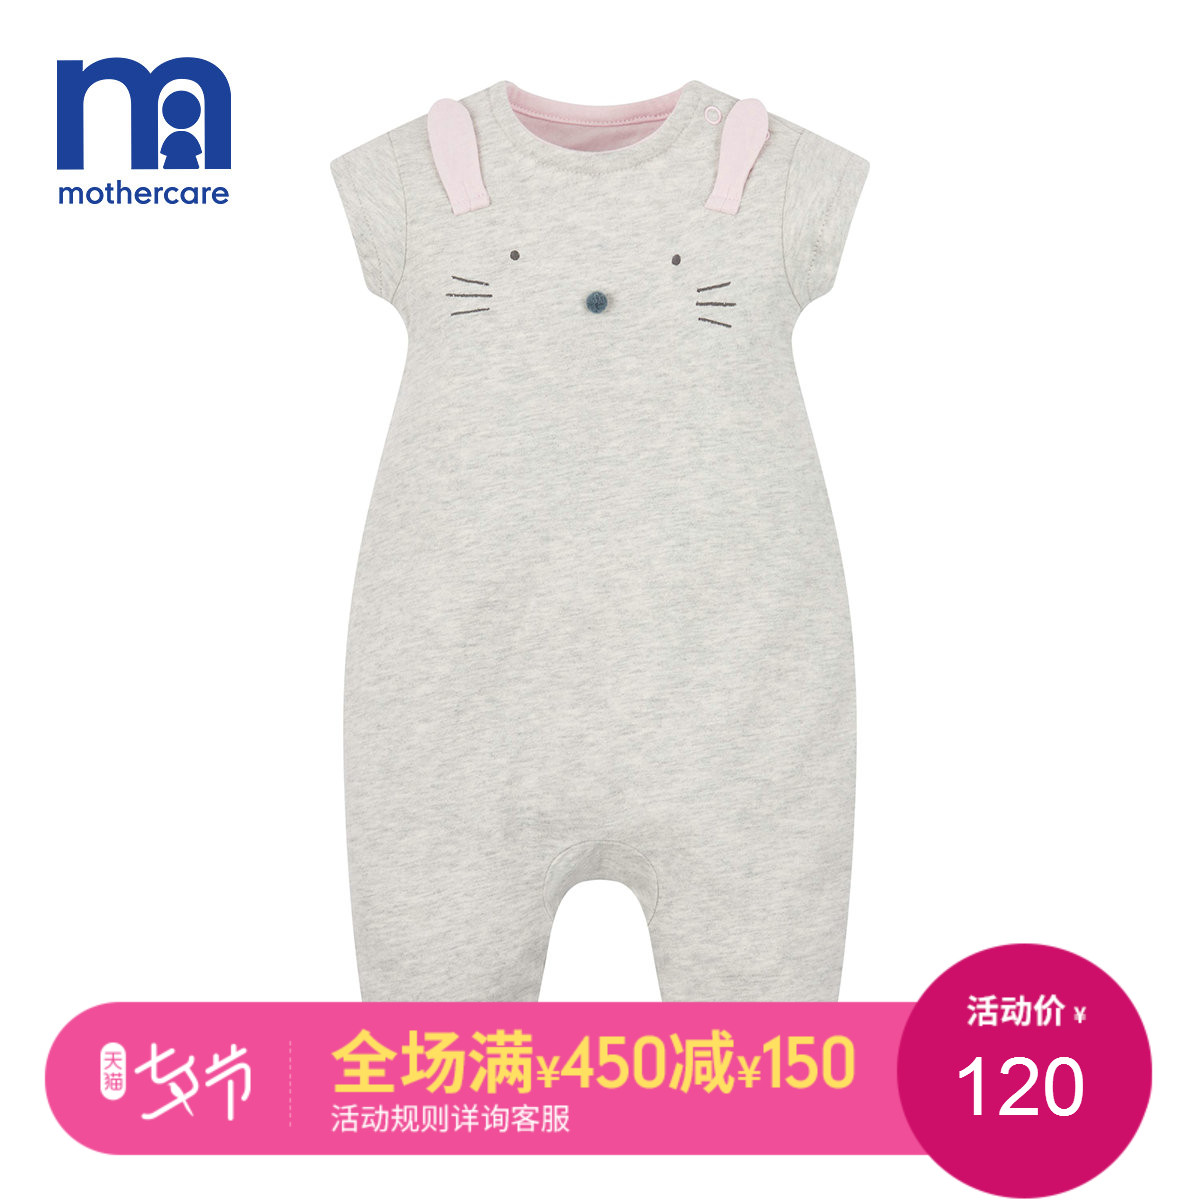 mothercare初生婴儿衣服哈衣春夏装女宝宝短袖可爱动物造型连体衣